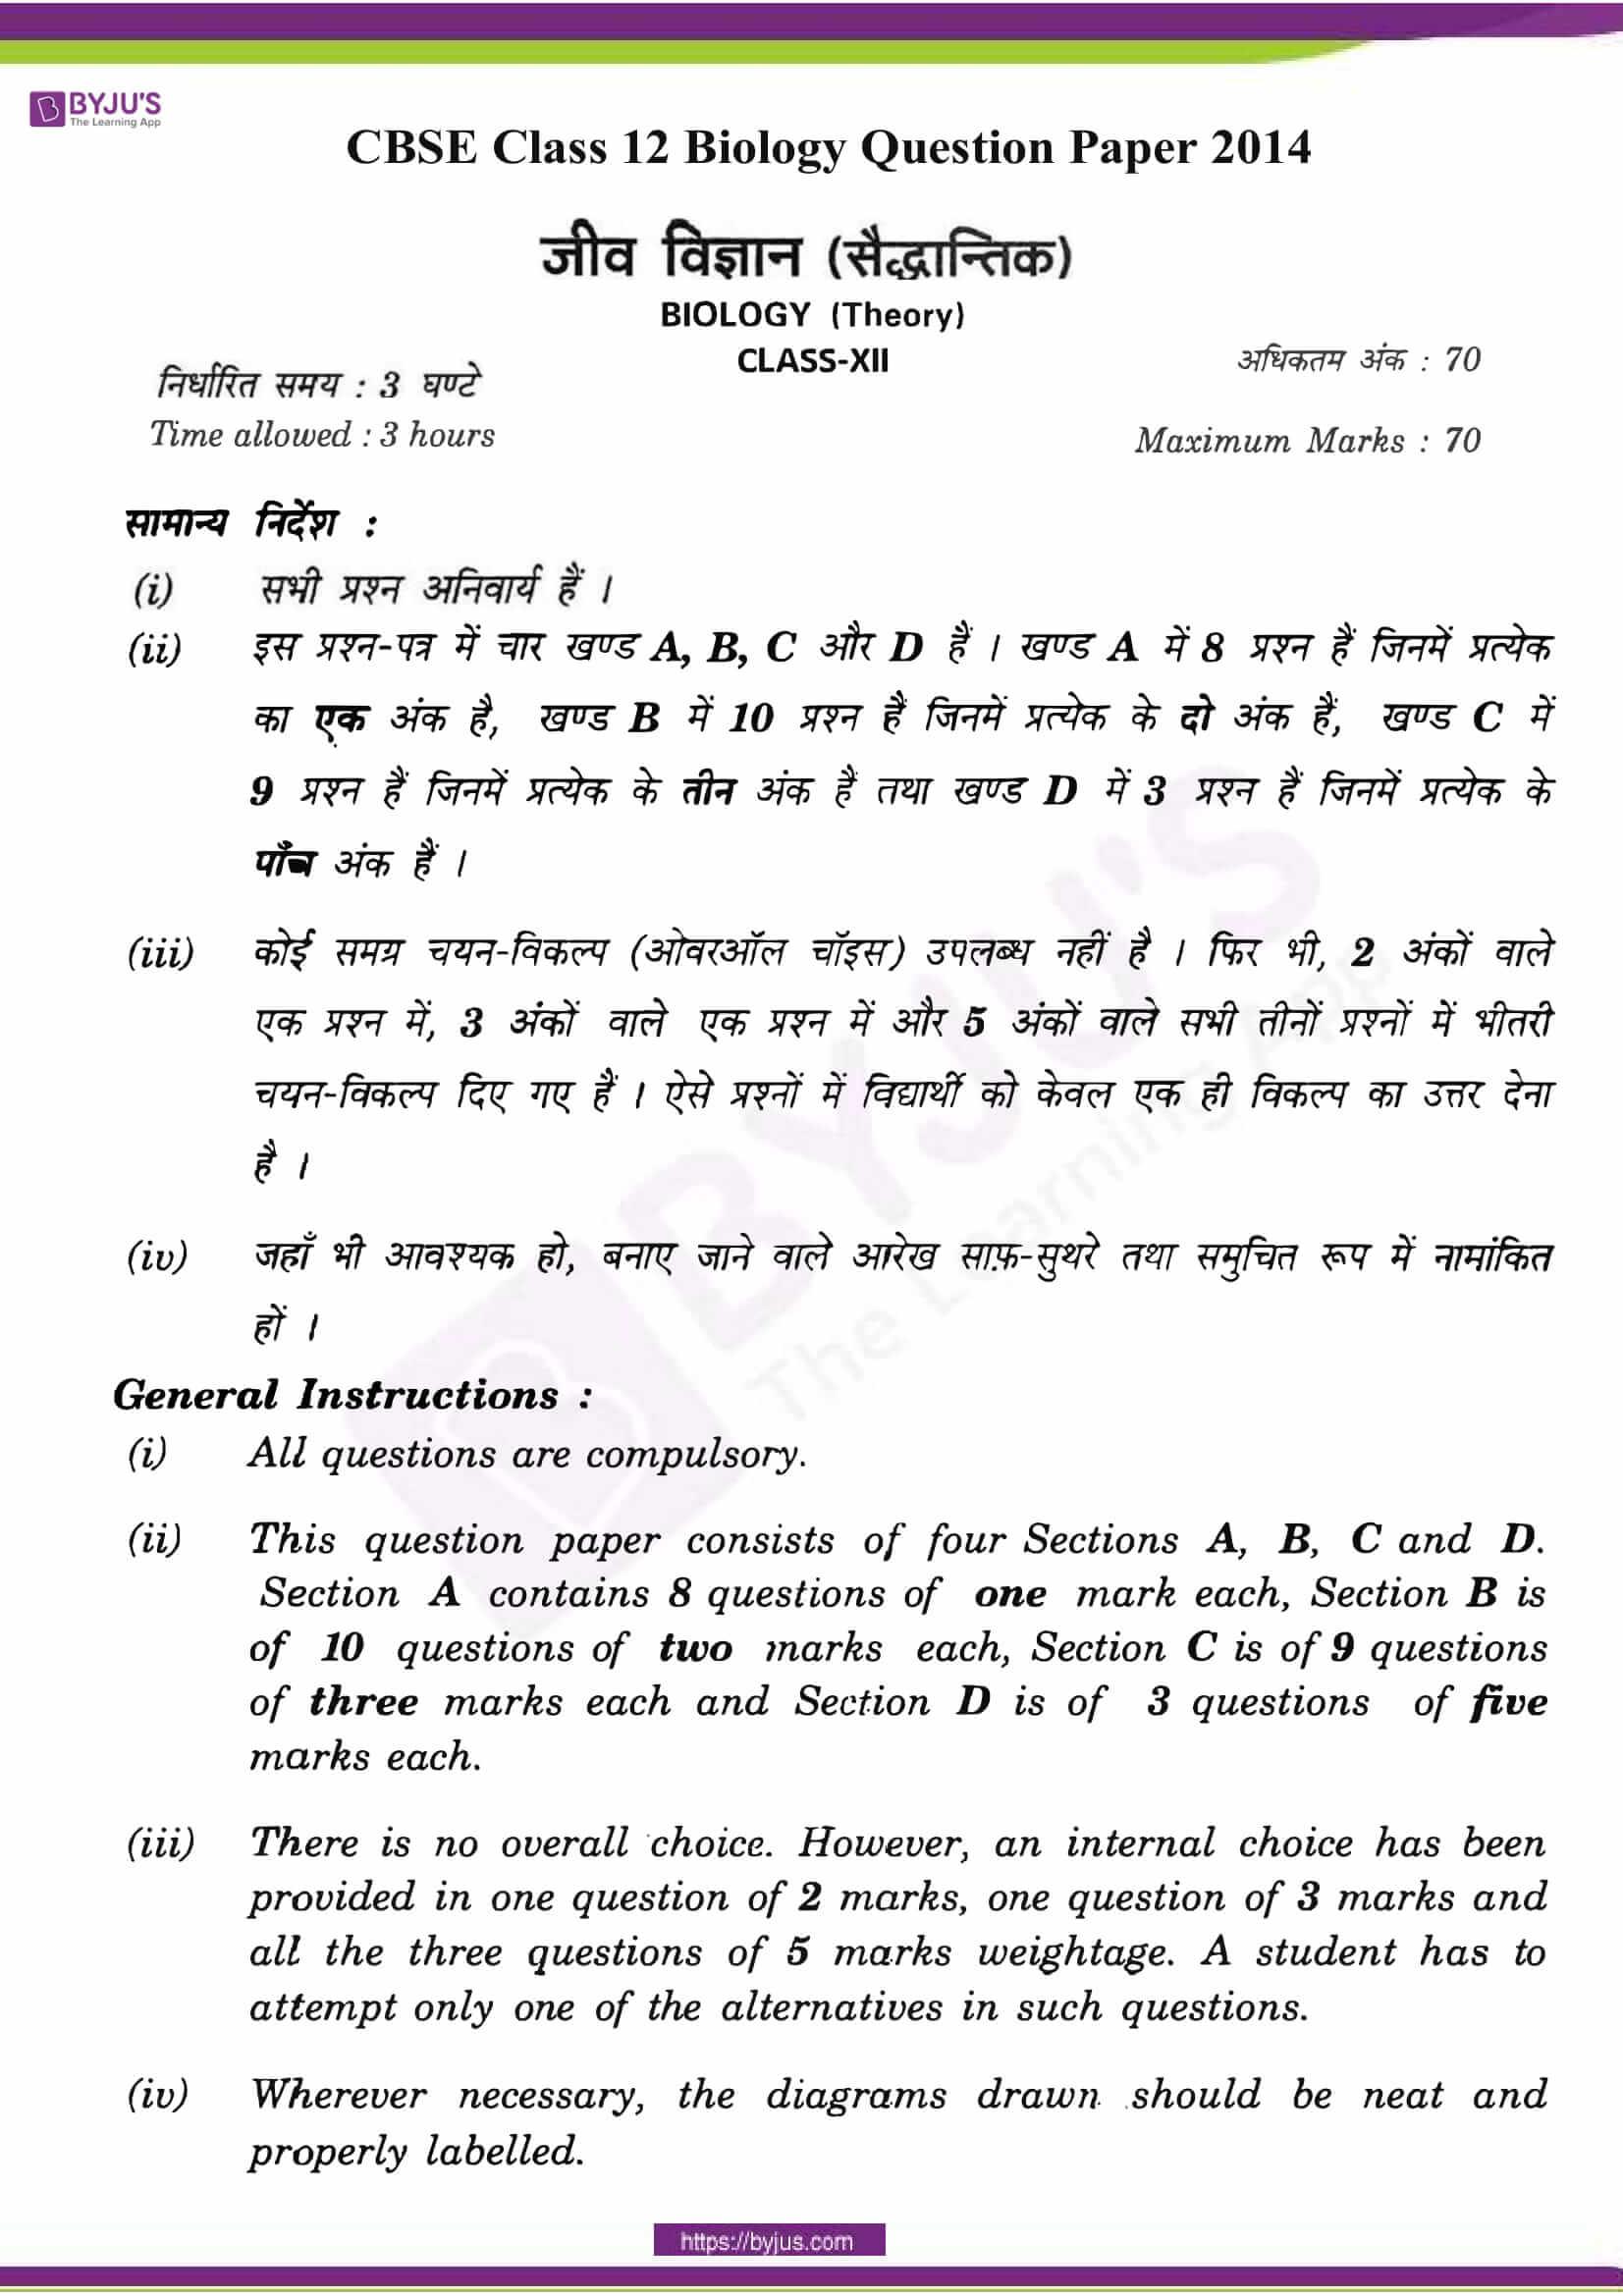 cbse class 12 qs paper 2014 bio set 1